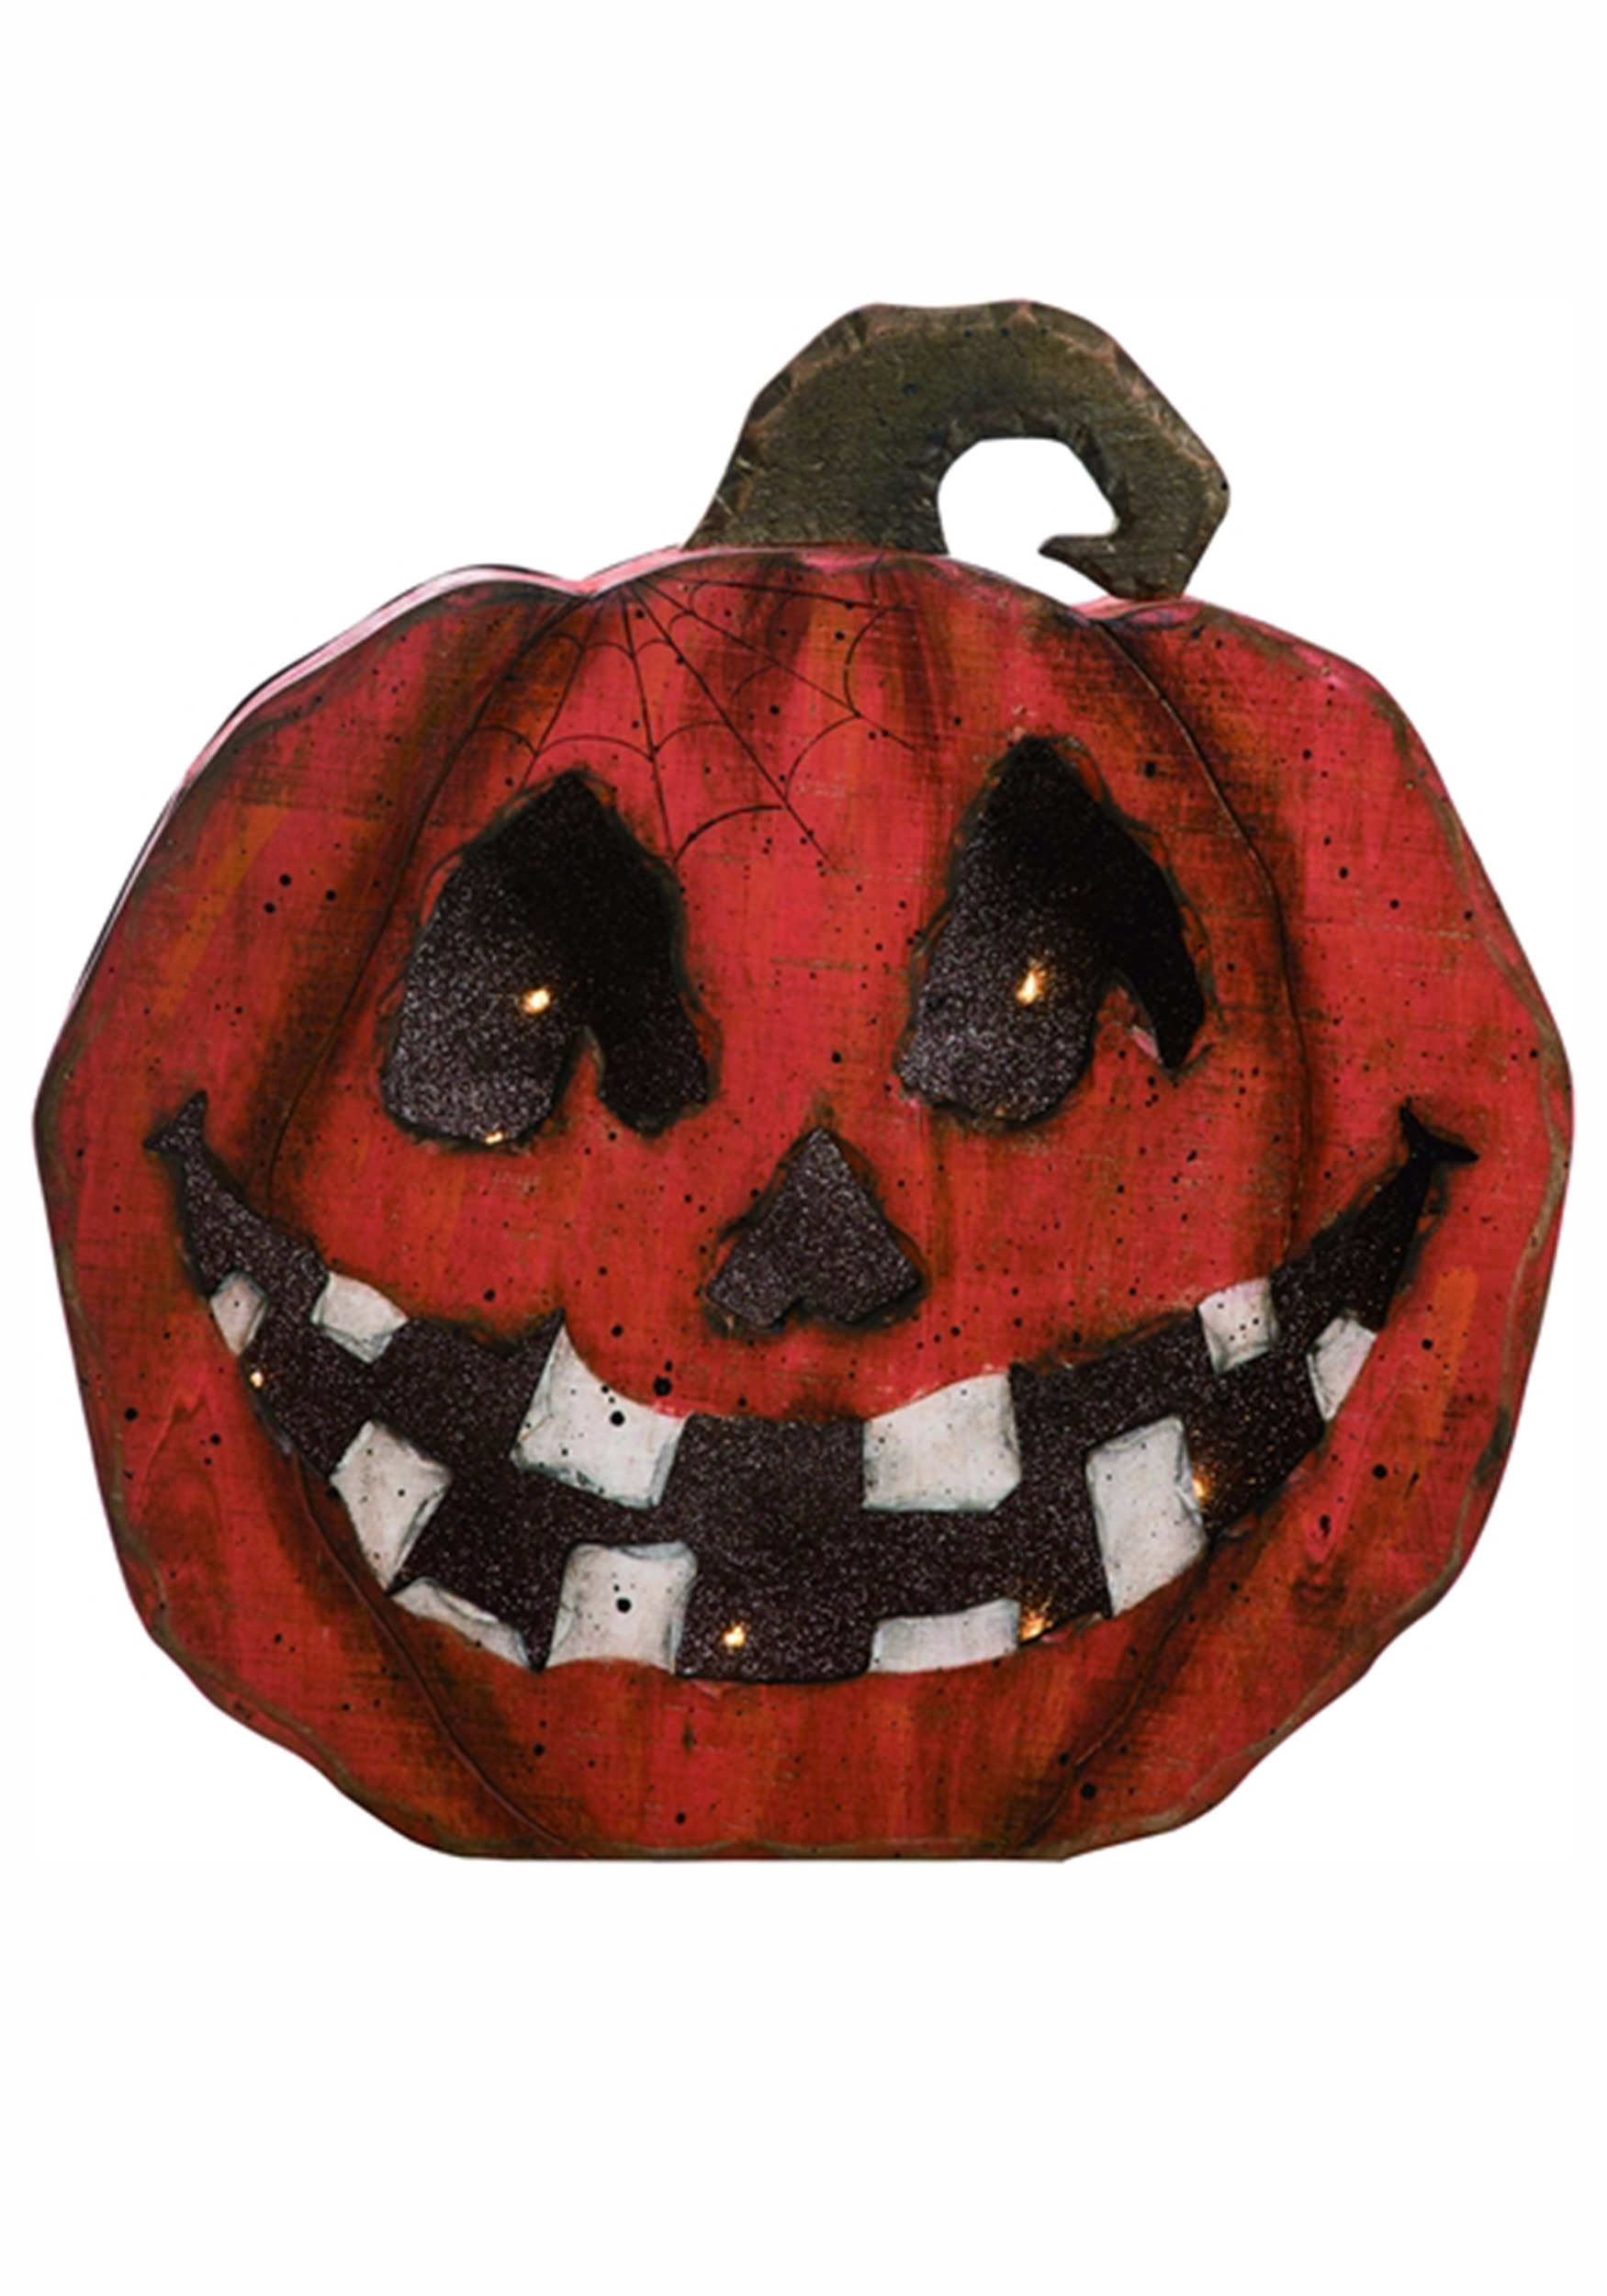 Jack O Lantern Face Pumpkin Wood Light Up Halloween Decor